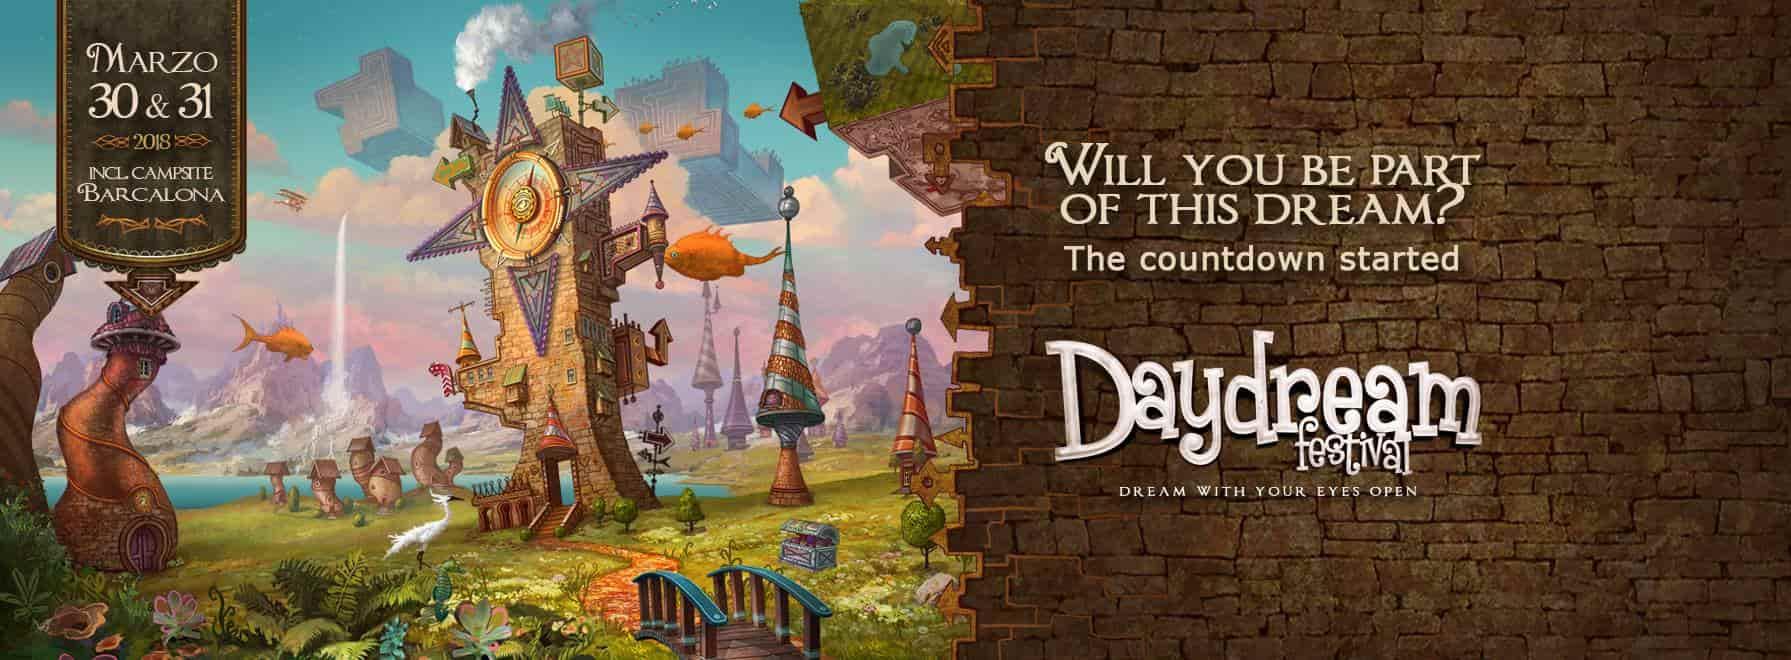 day dream festival